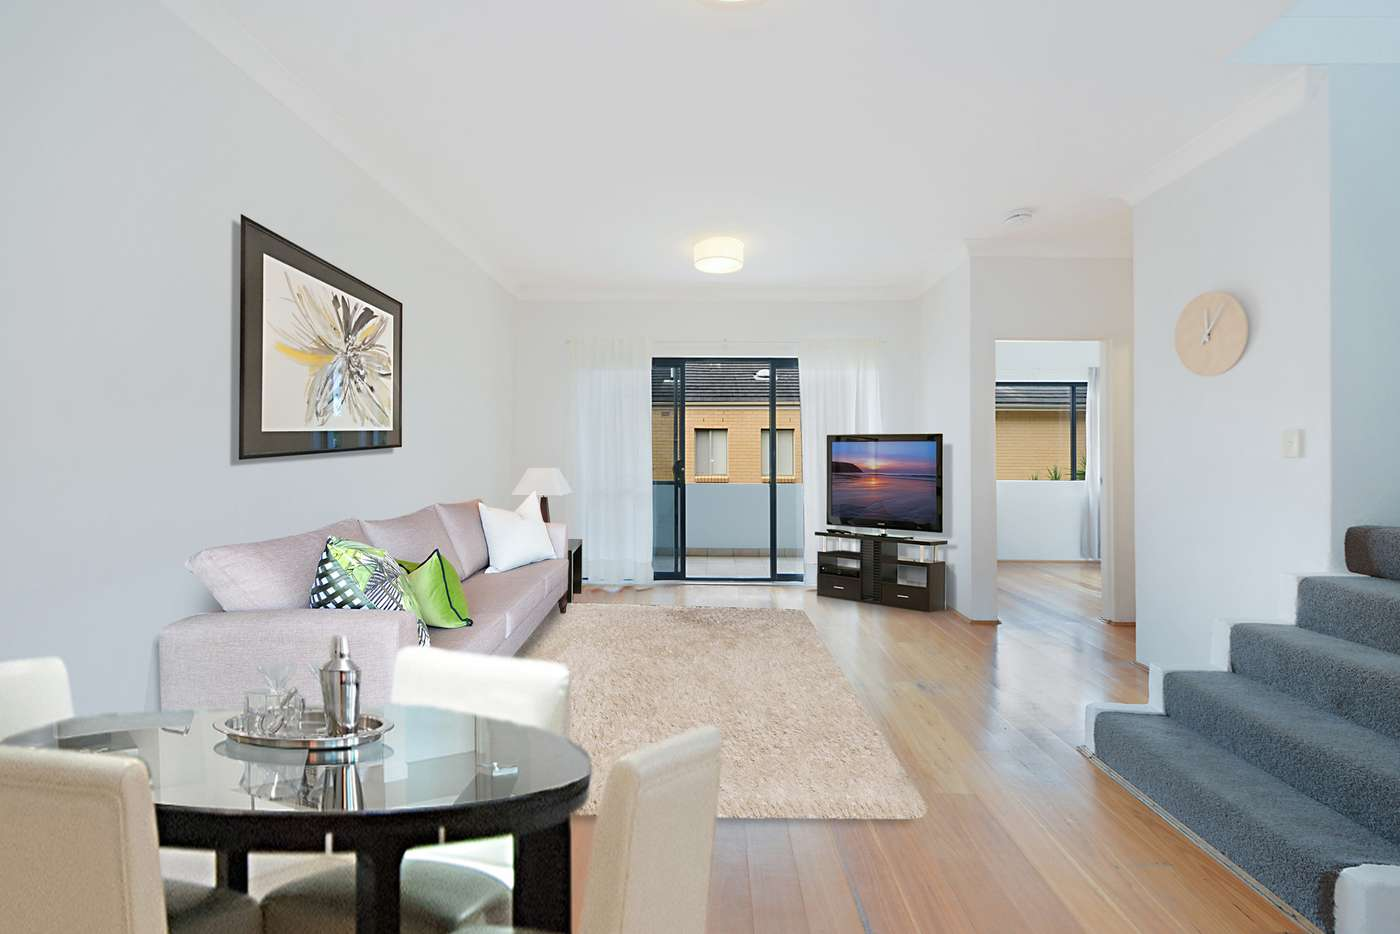 Main view of Homely apartment listing, 13/66 Beach Road, Bondi Beach NSW 2026